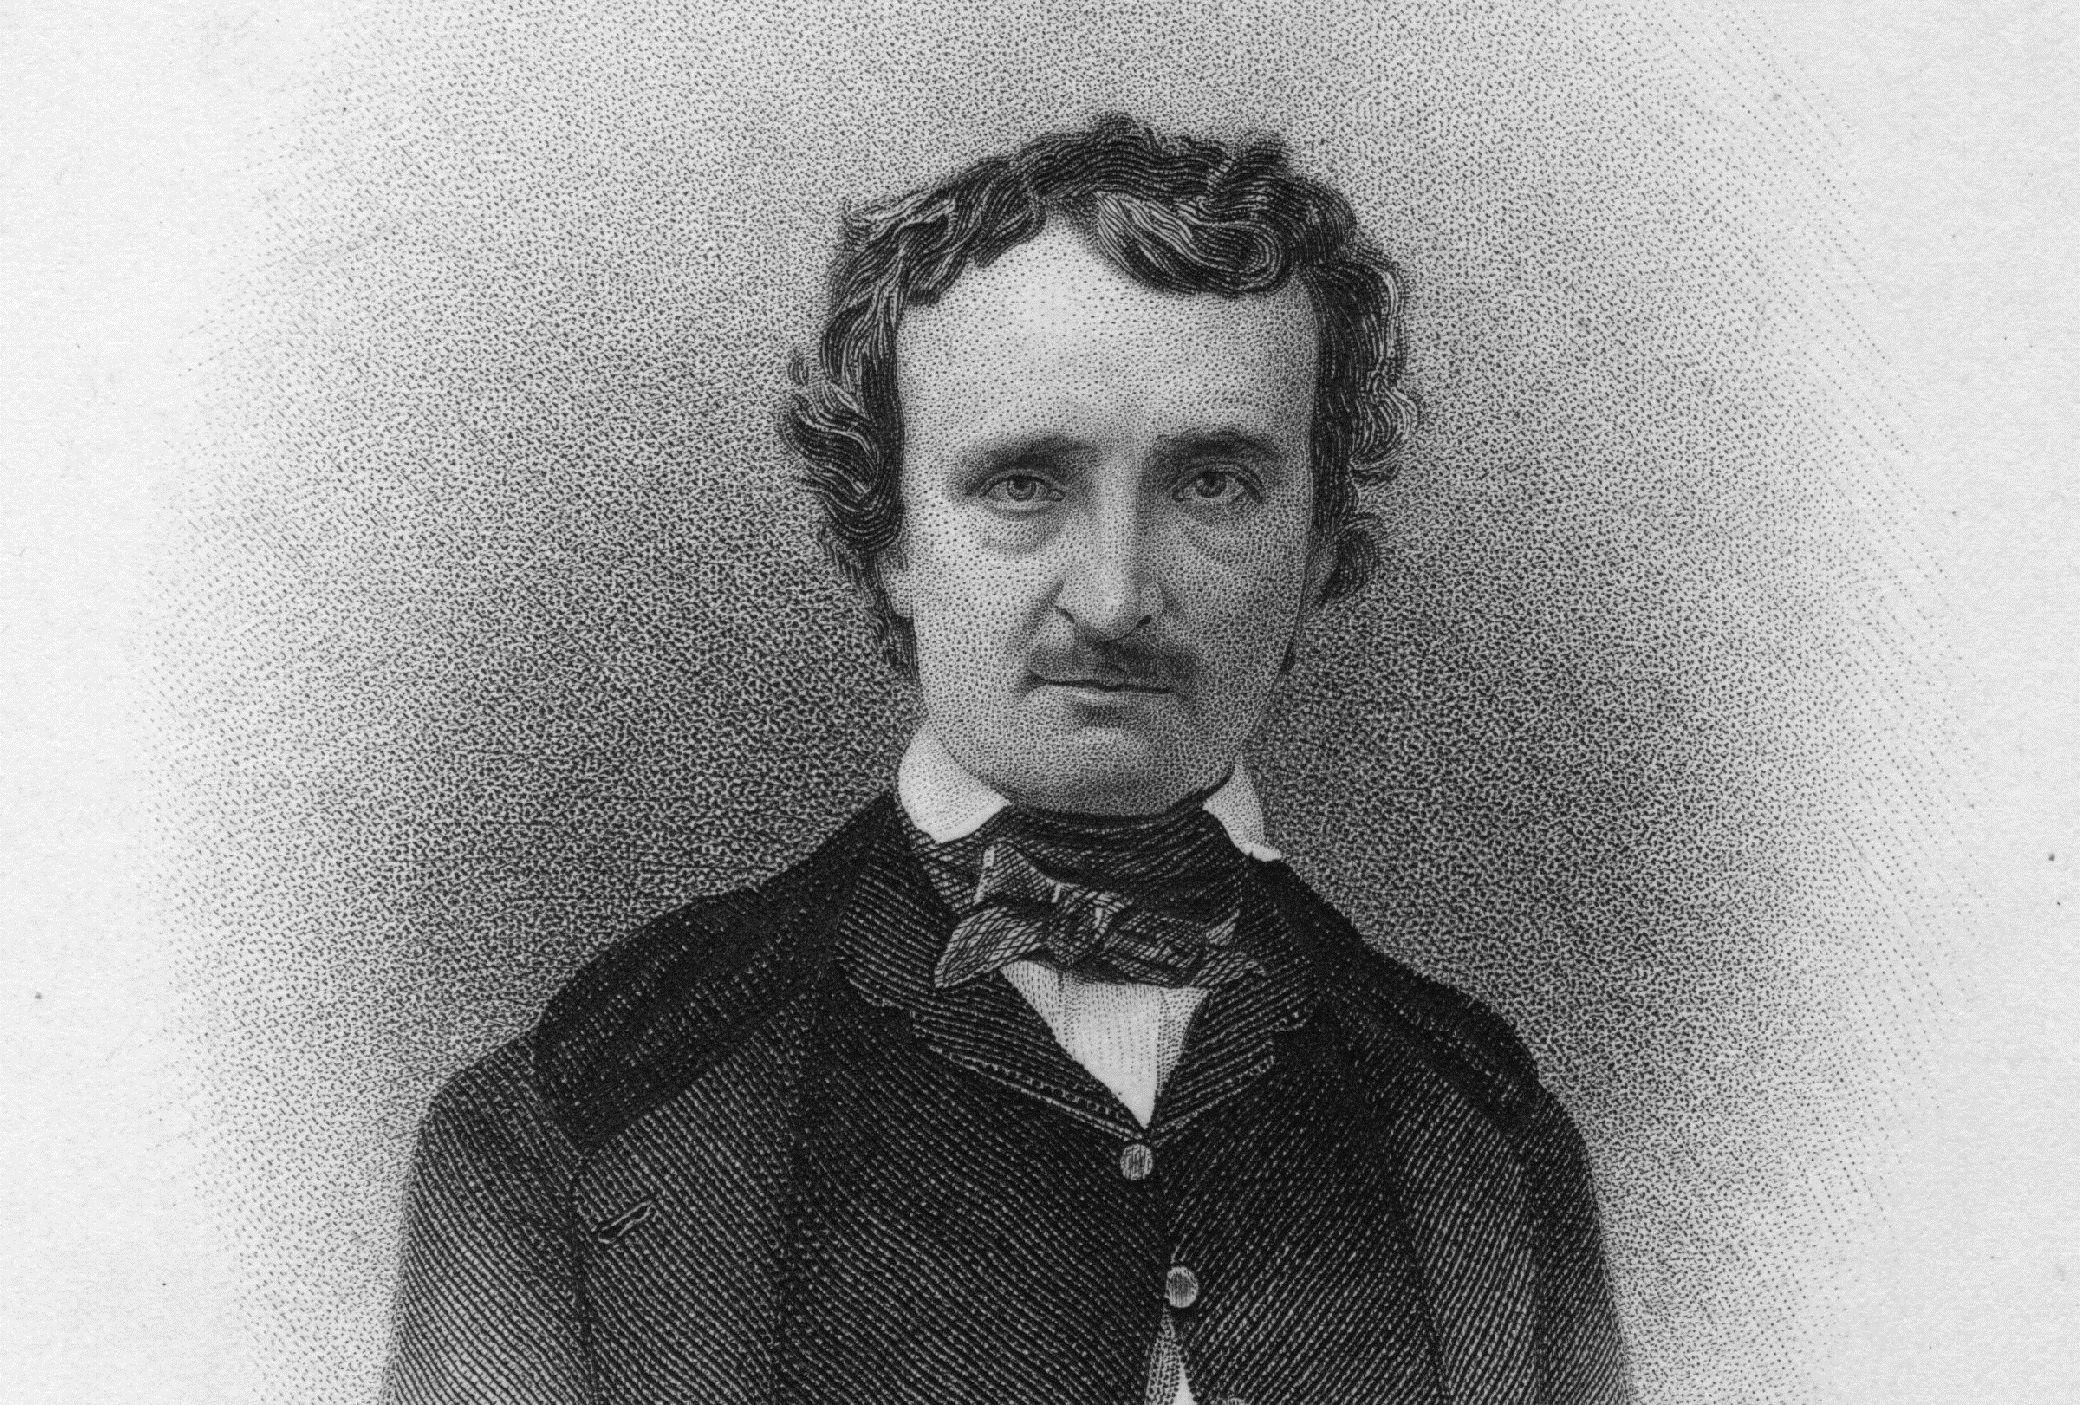 Engraved portrait of Edgar Allan Poe